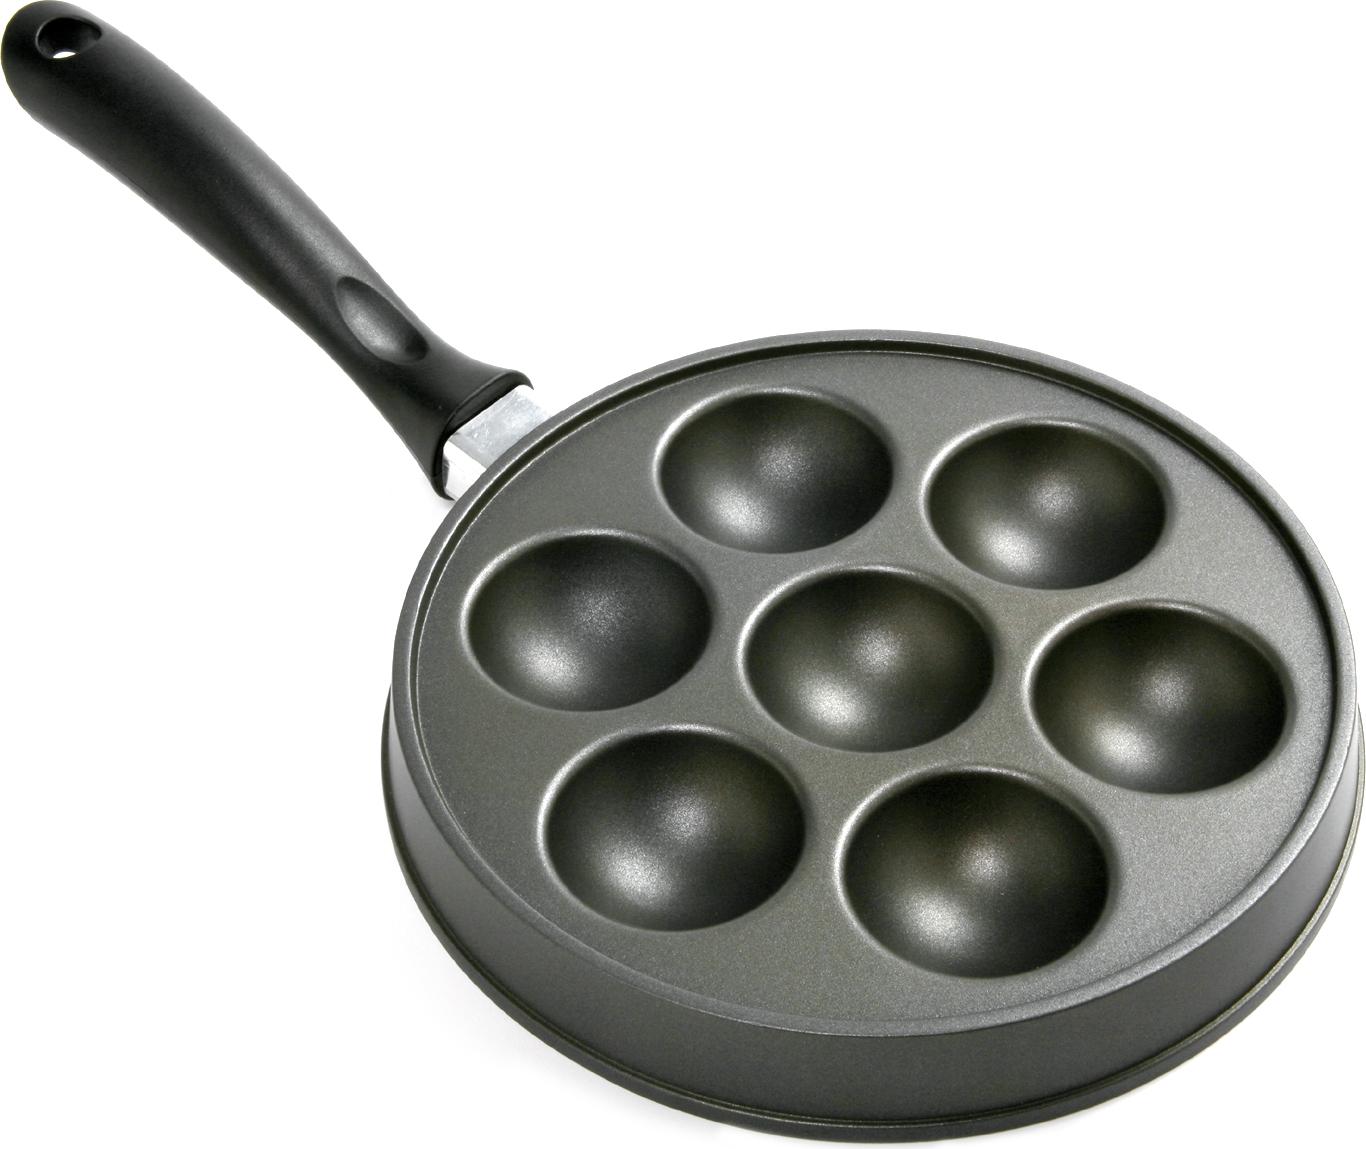 Norpro Nonstick Danish Ebleskiver Stuffed Pancake Pan, 9 Inch